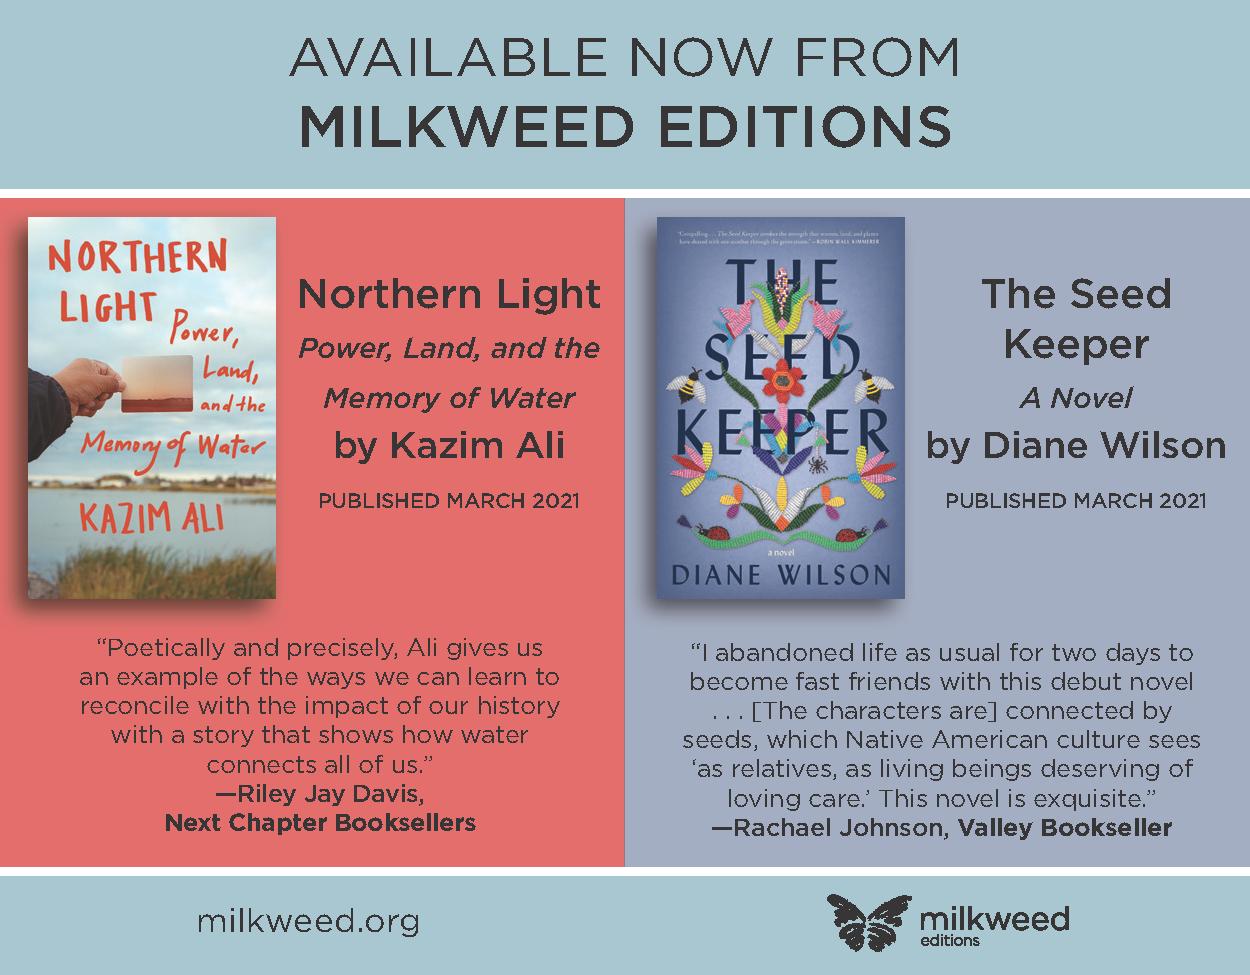 Milkweed Ad